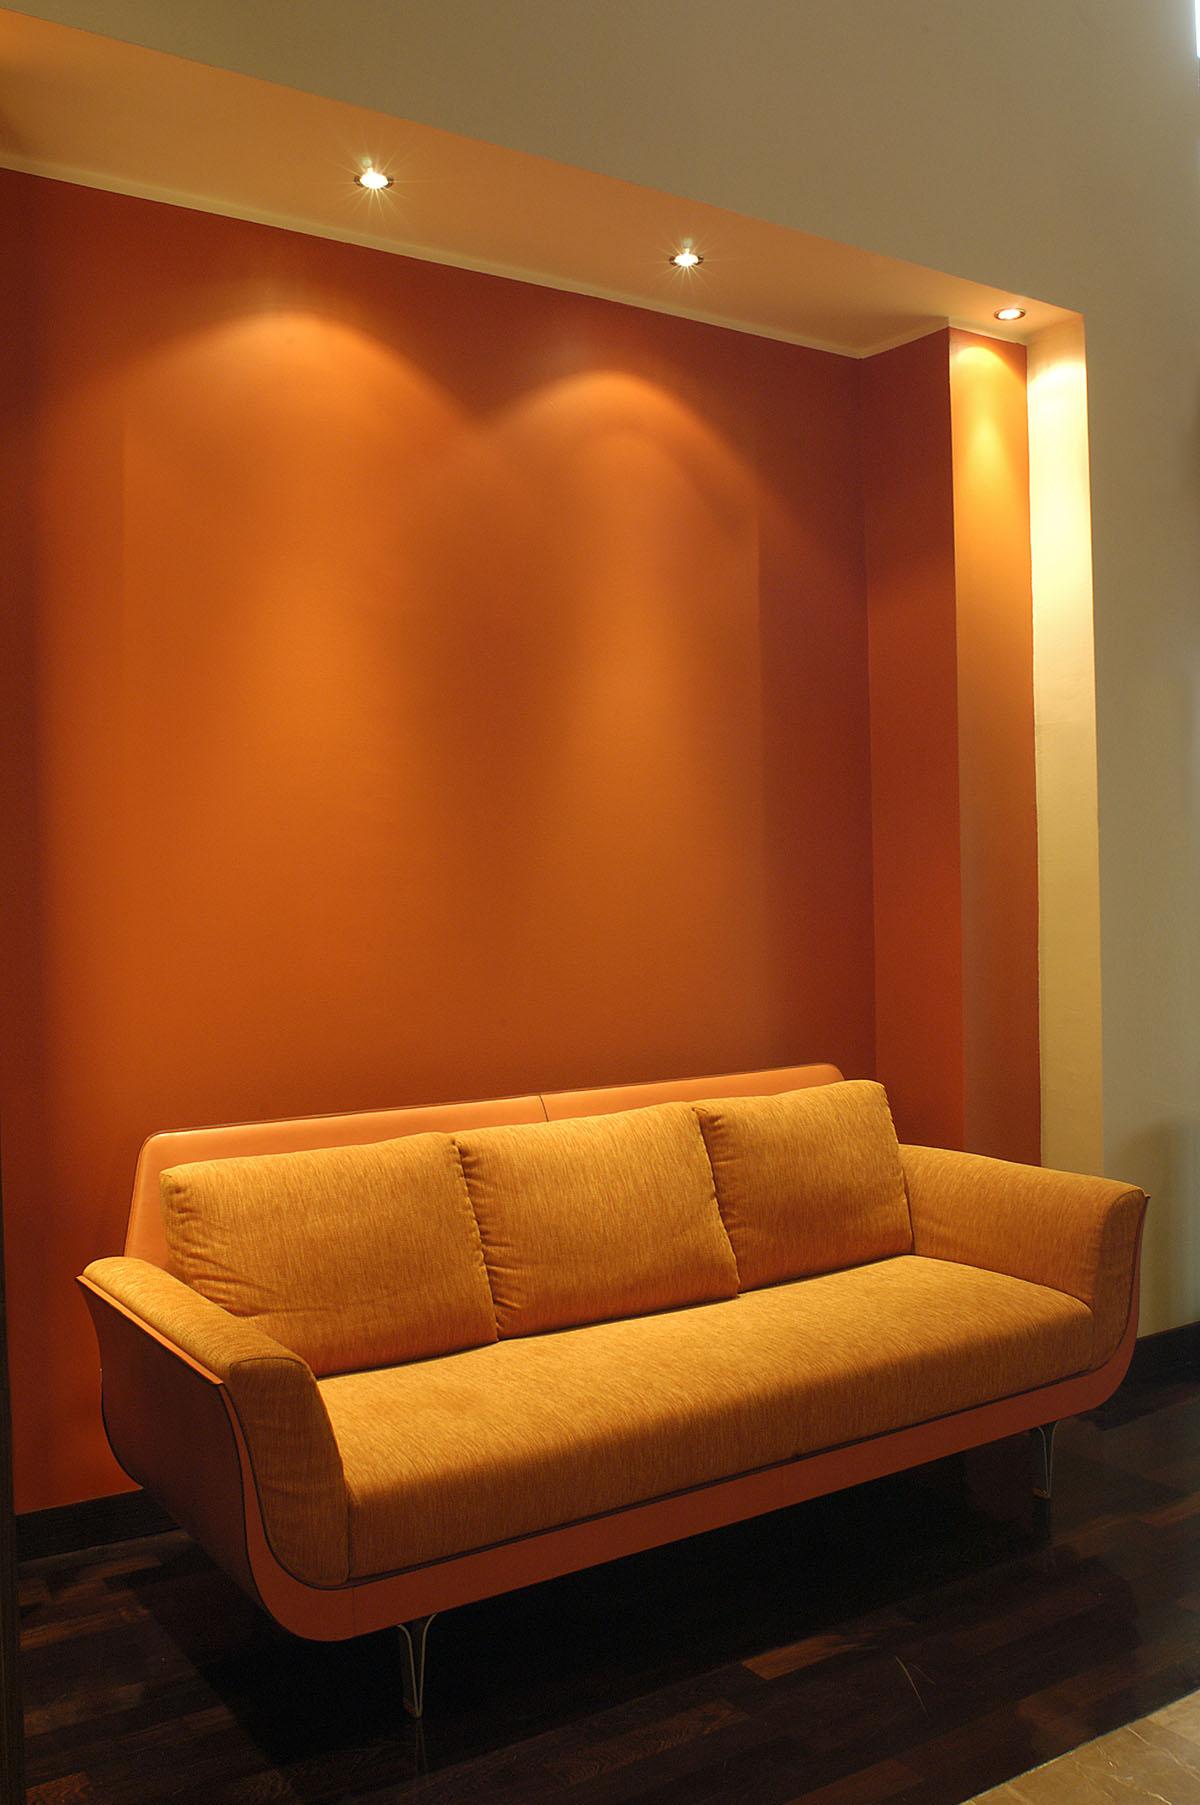 1_Hotel Litta Palace (6_1)